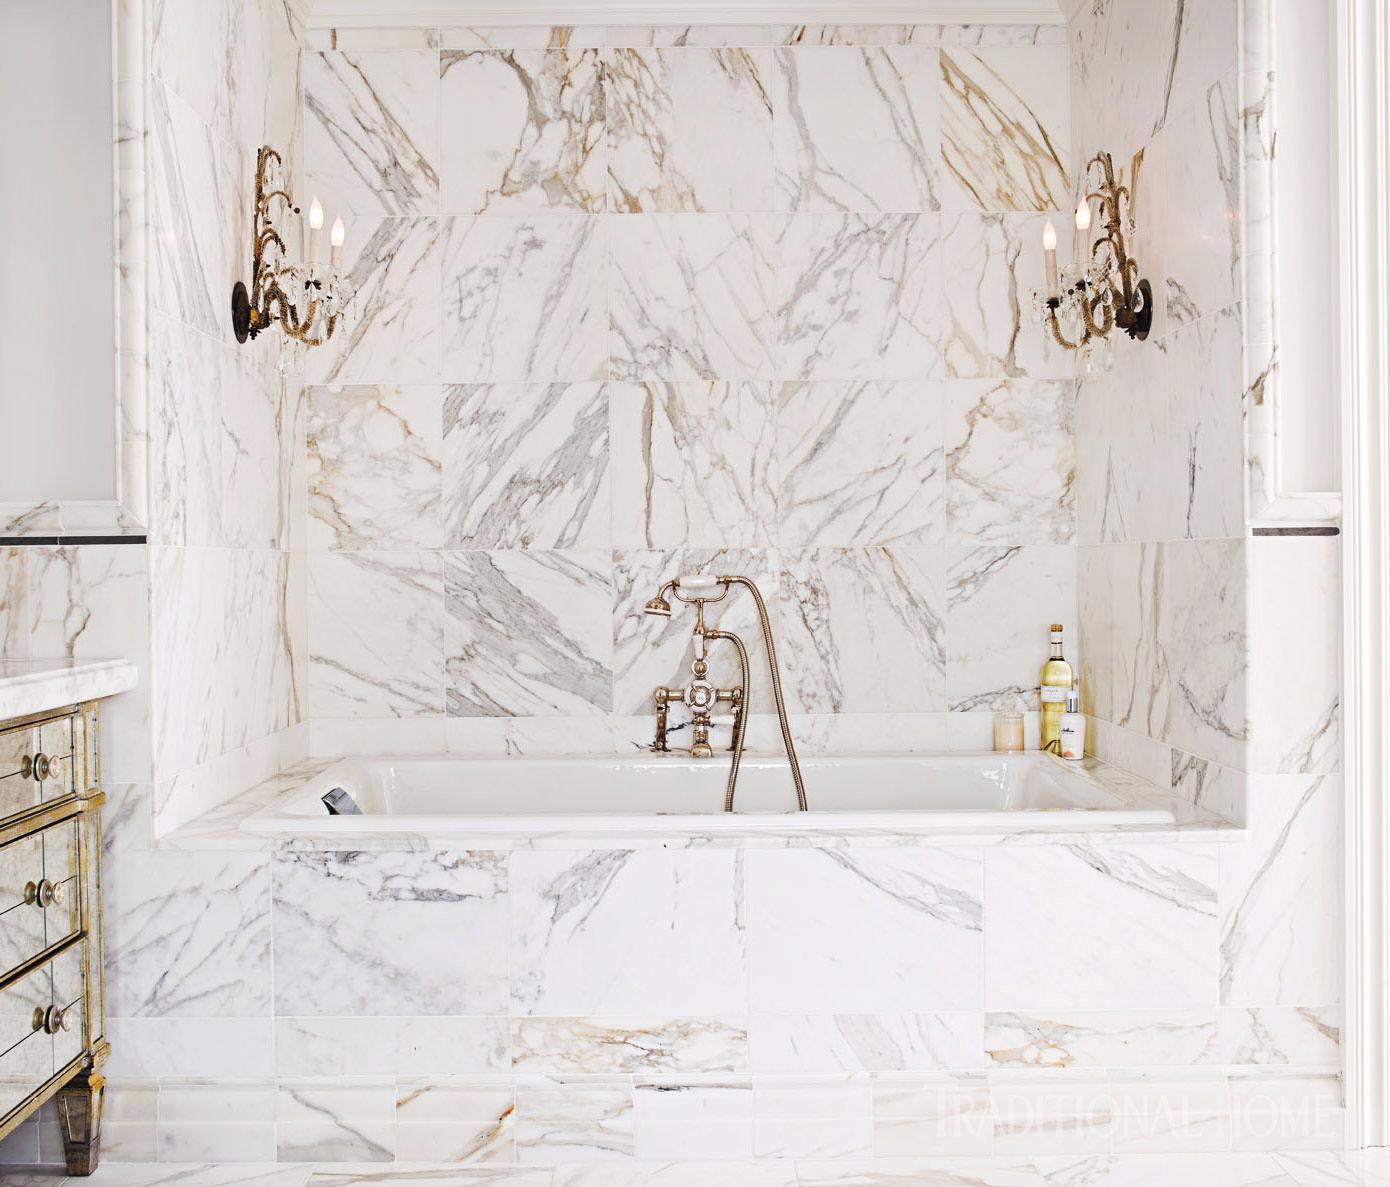 Redux | Décor Inspiration: A Powder Room by Designer Carrie Hayden, Seattle